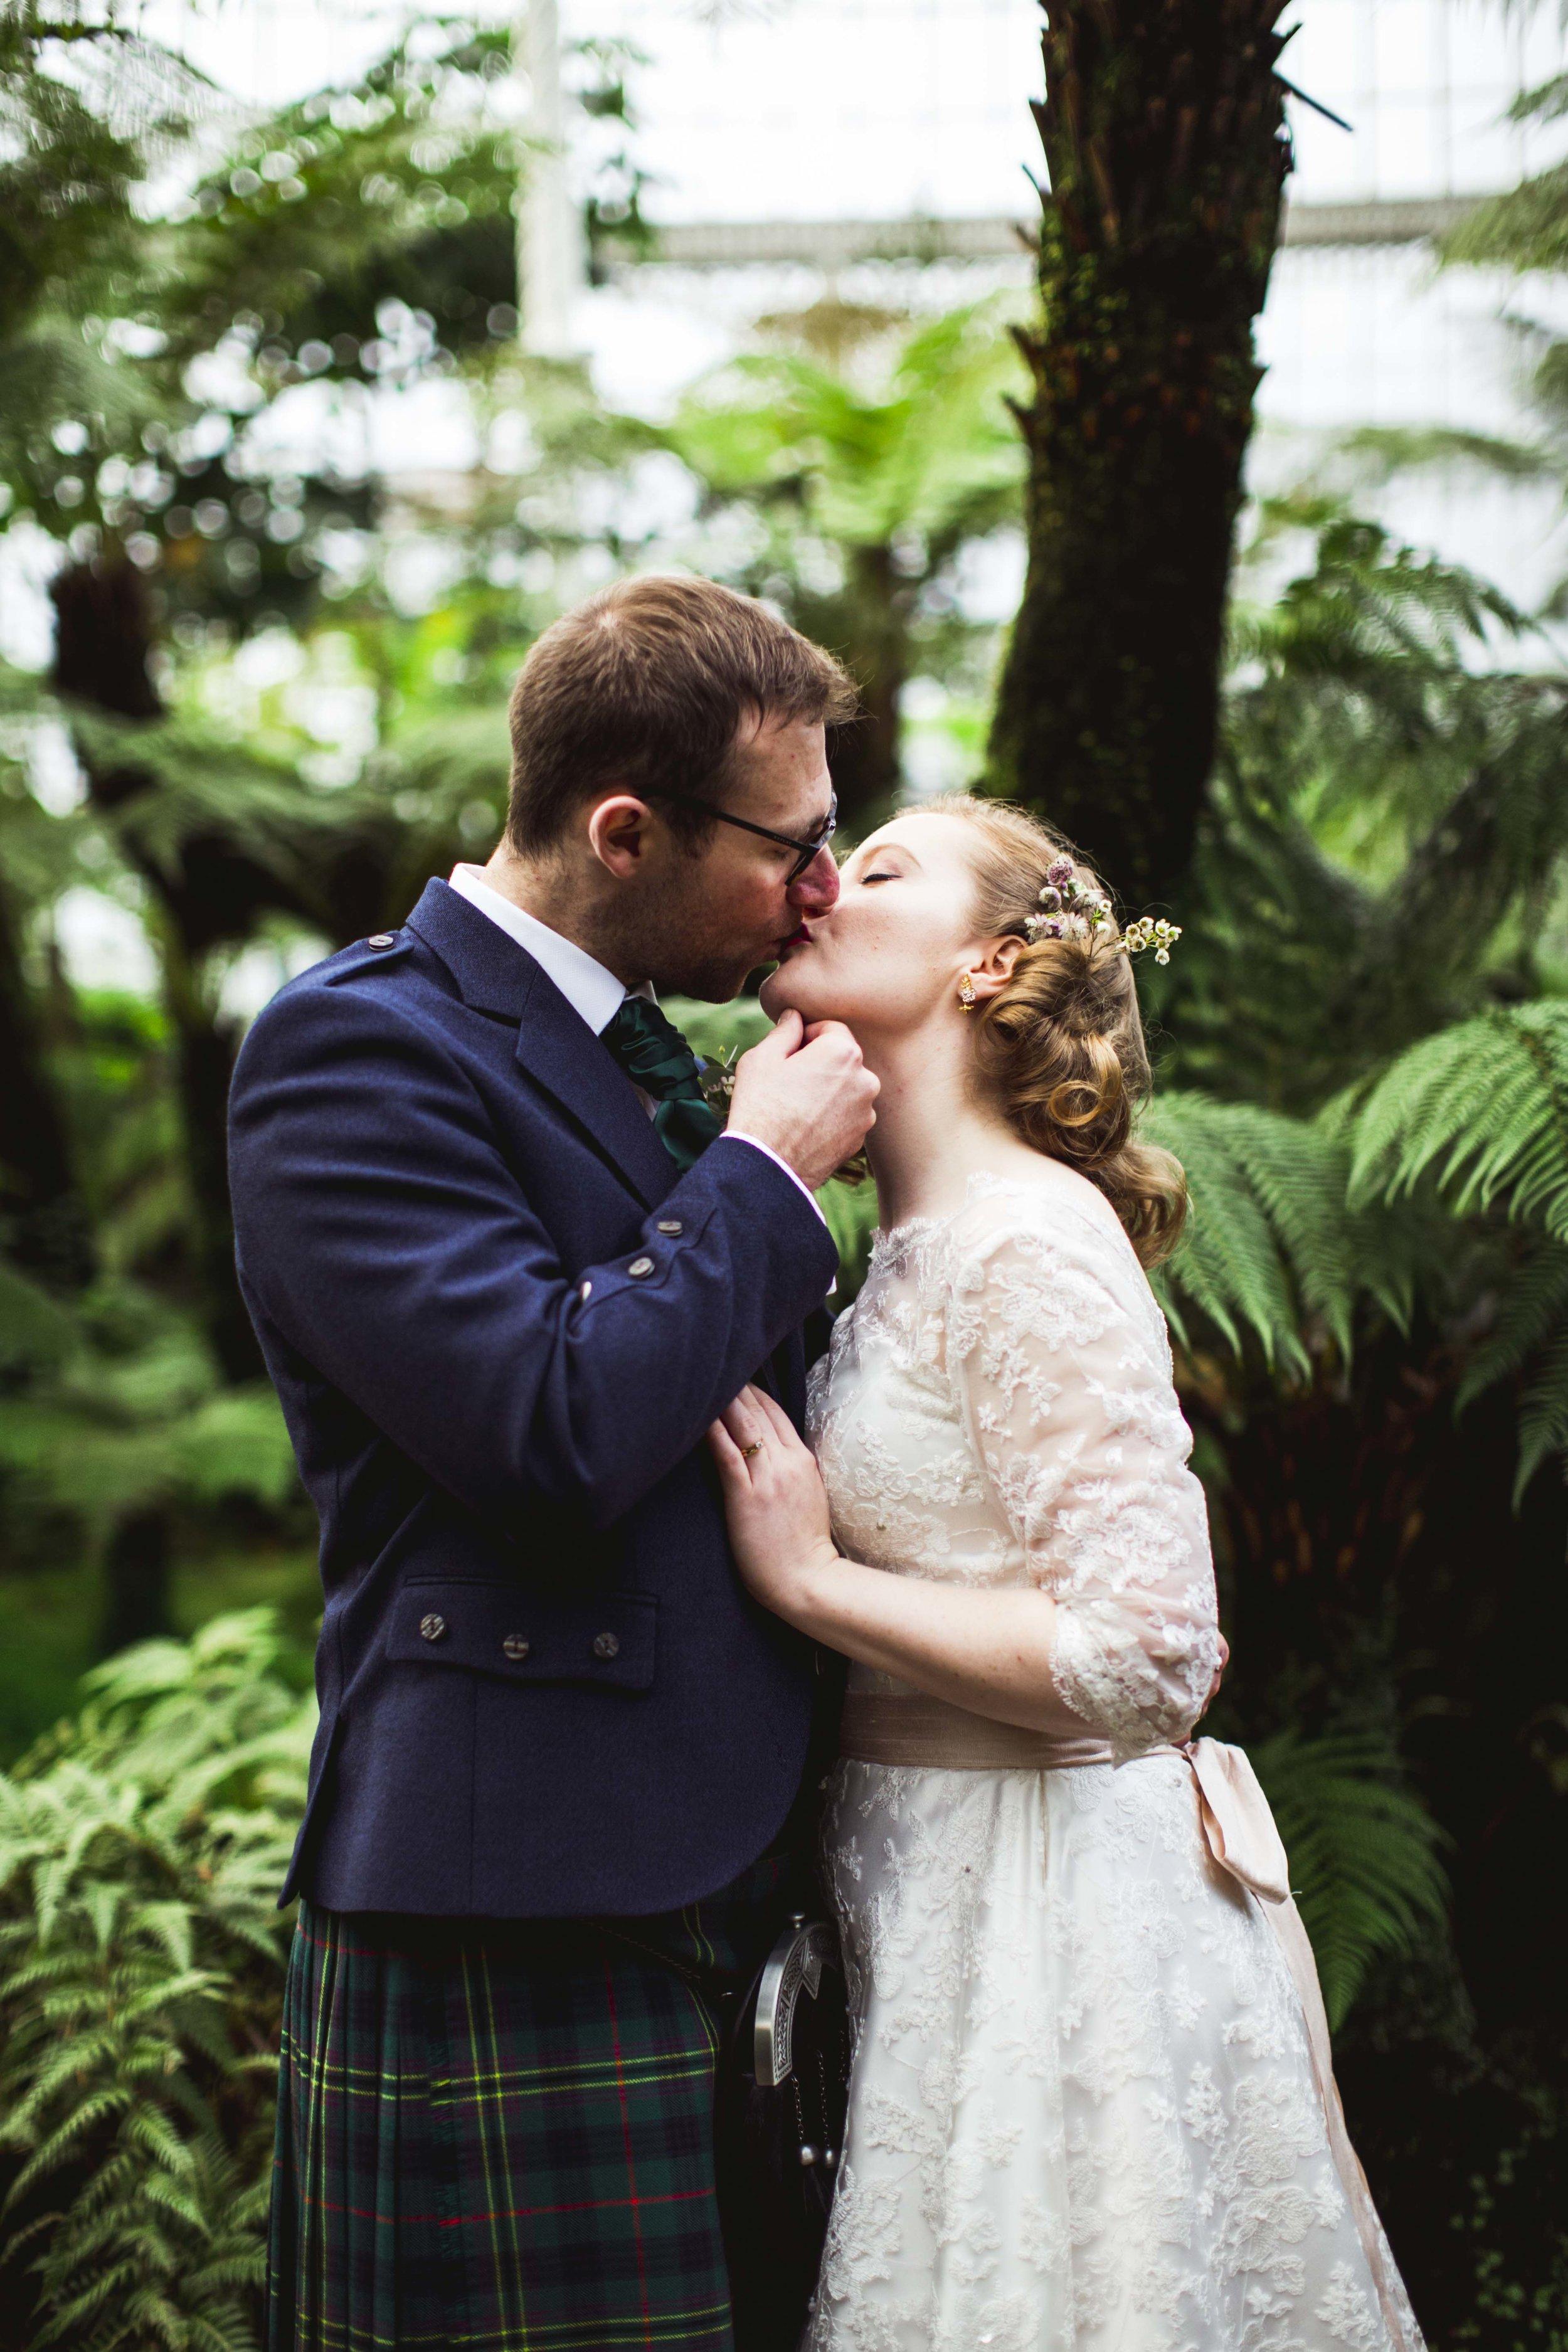 Sophie & Graeme Wedding Nov 2018  187  web.JPG